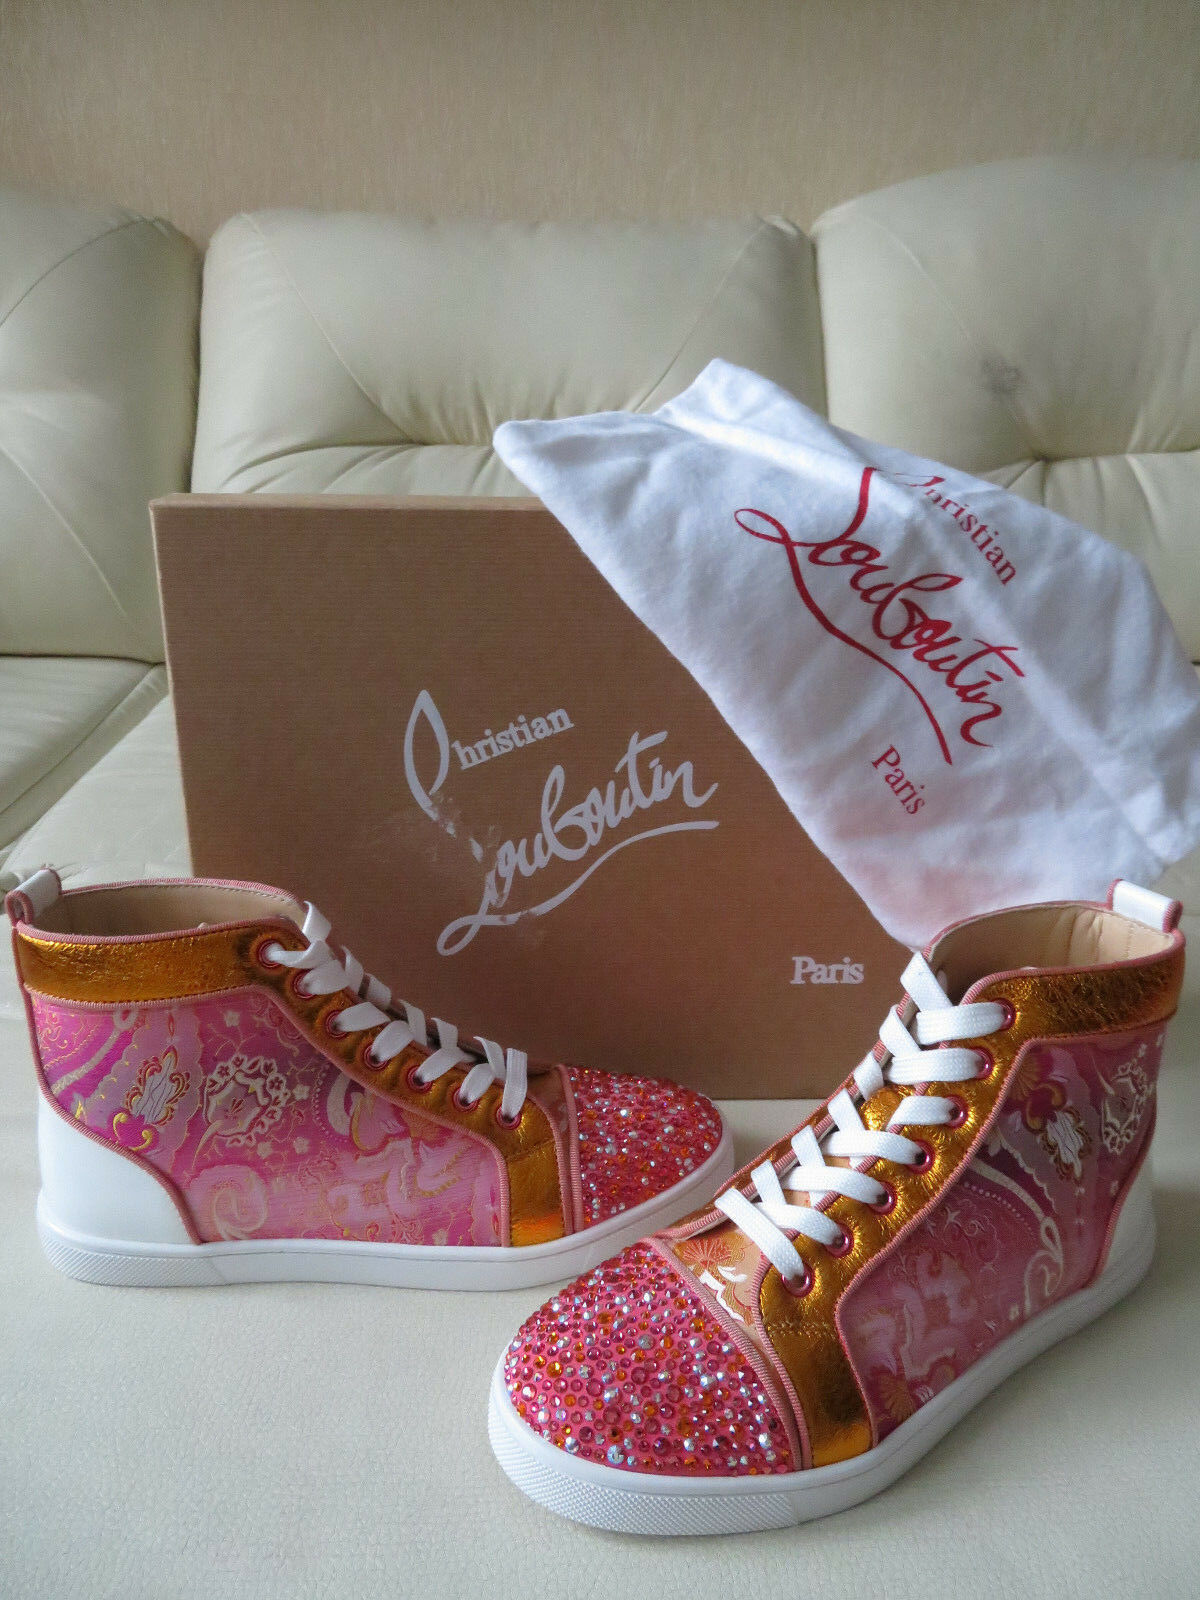 NEW Christian Louboutin Bip Bip Rantus Orlato Multi Strass High Top Sneaker 37.5